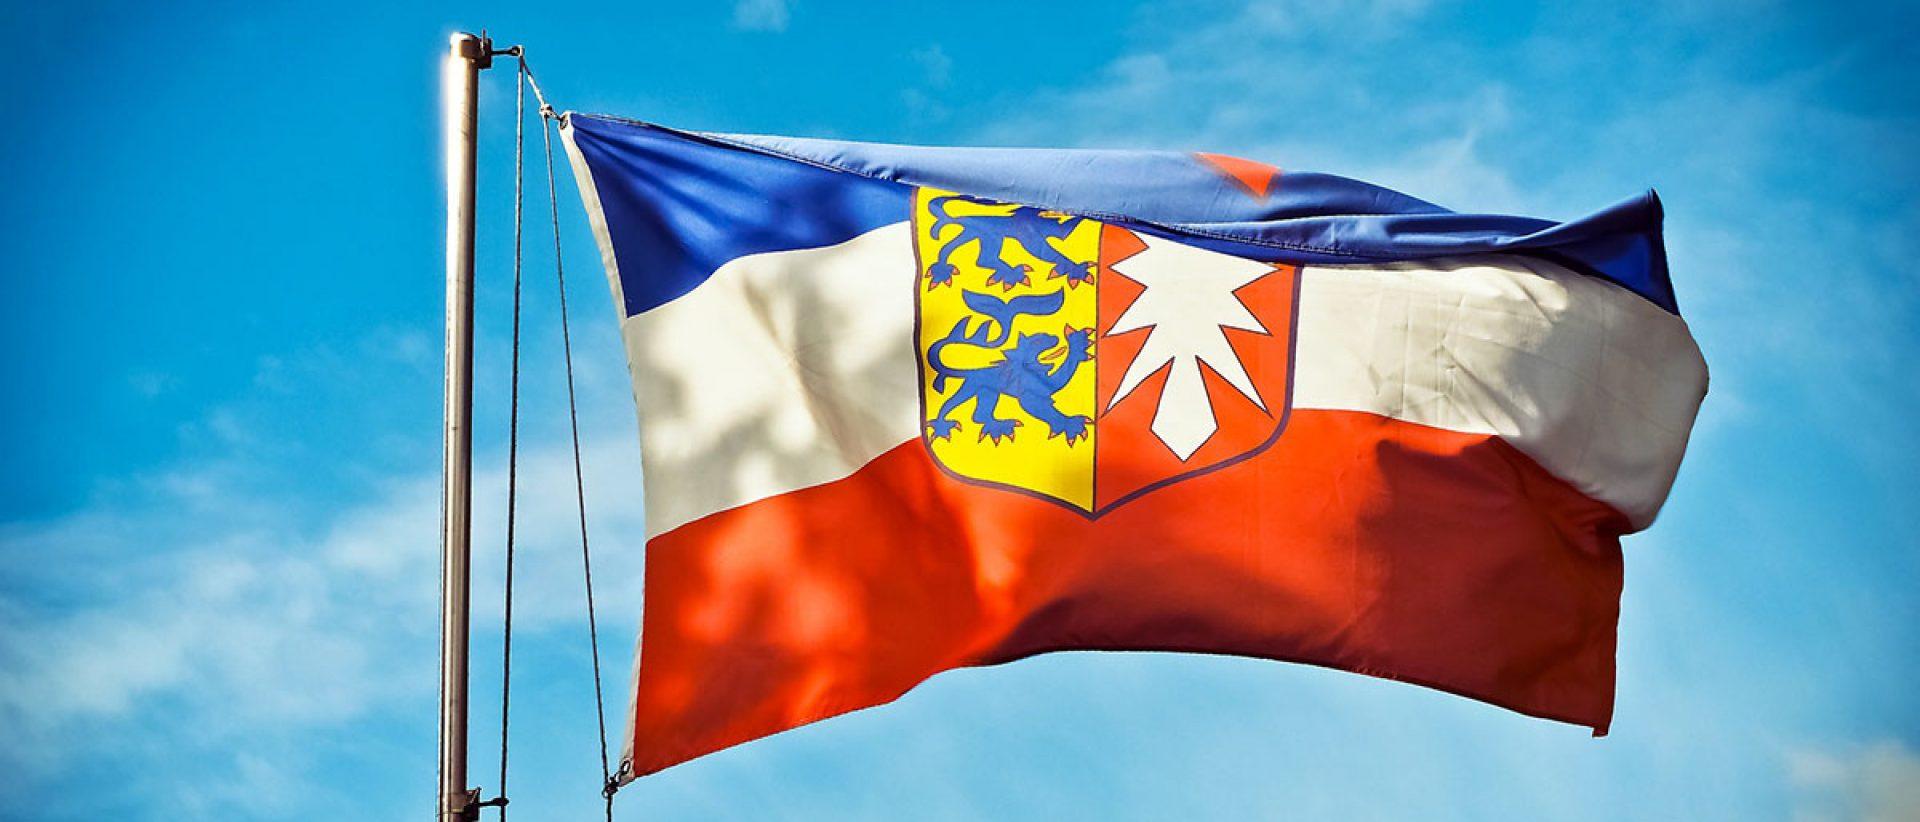 flag-1750790_1920.jpg schleswig holstein flagge